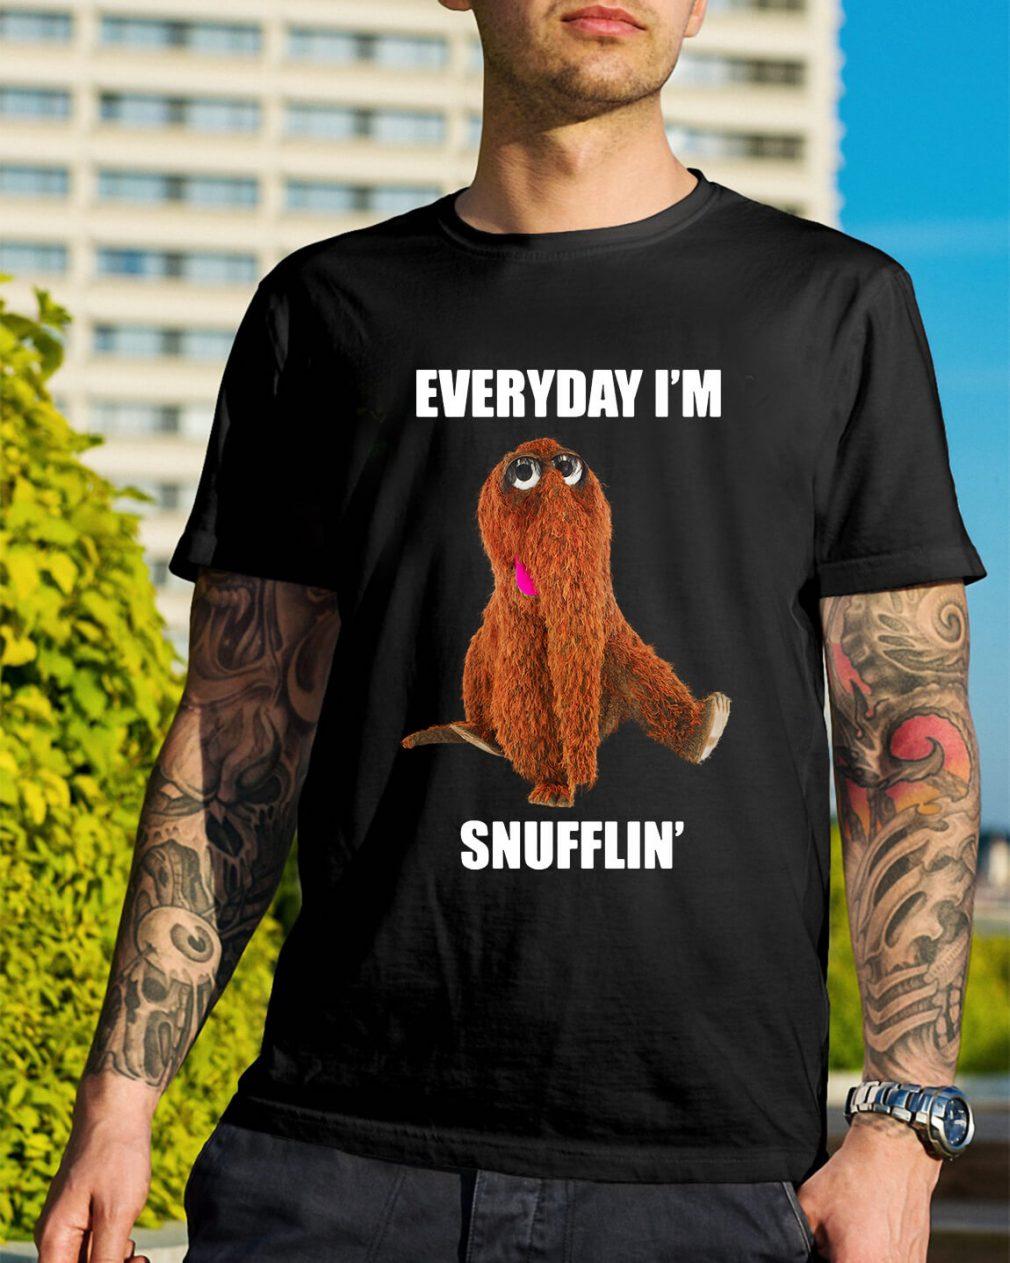 Everyday I'm Snufflin' shirt